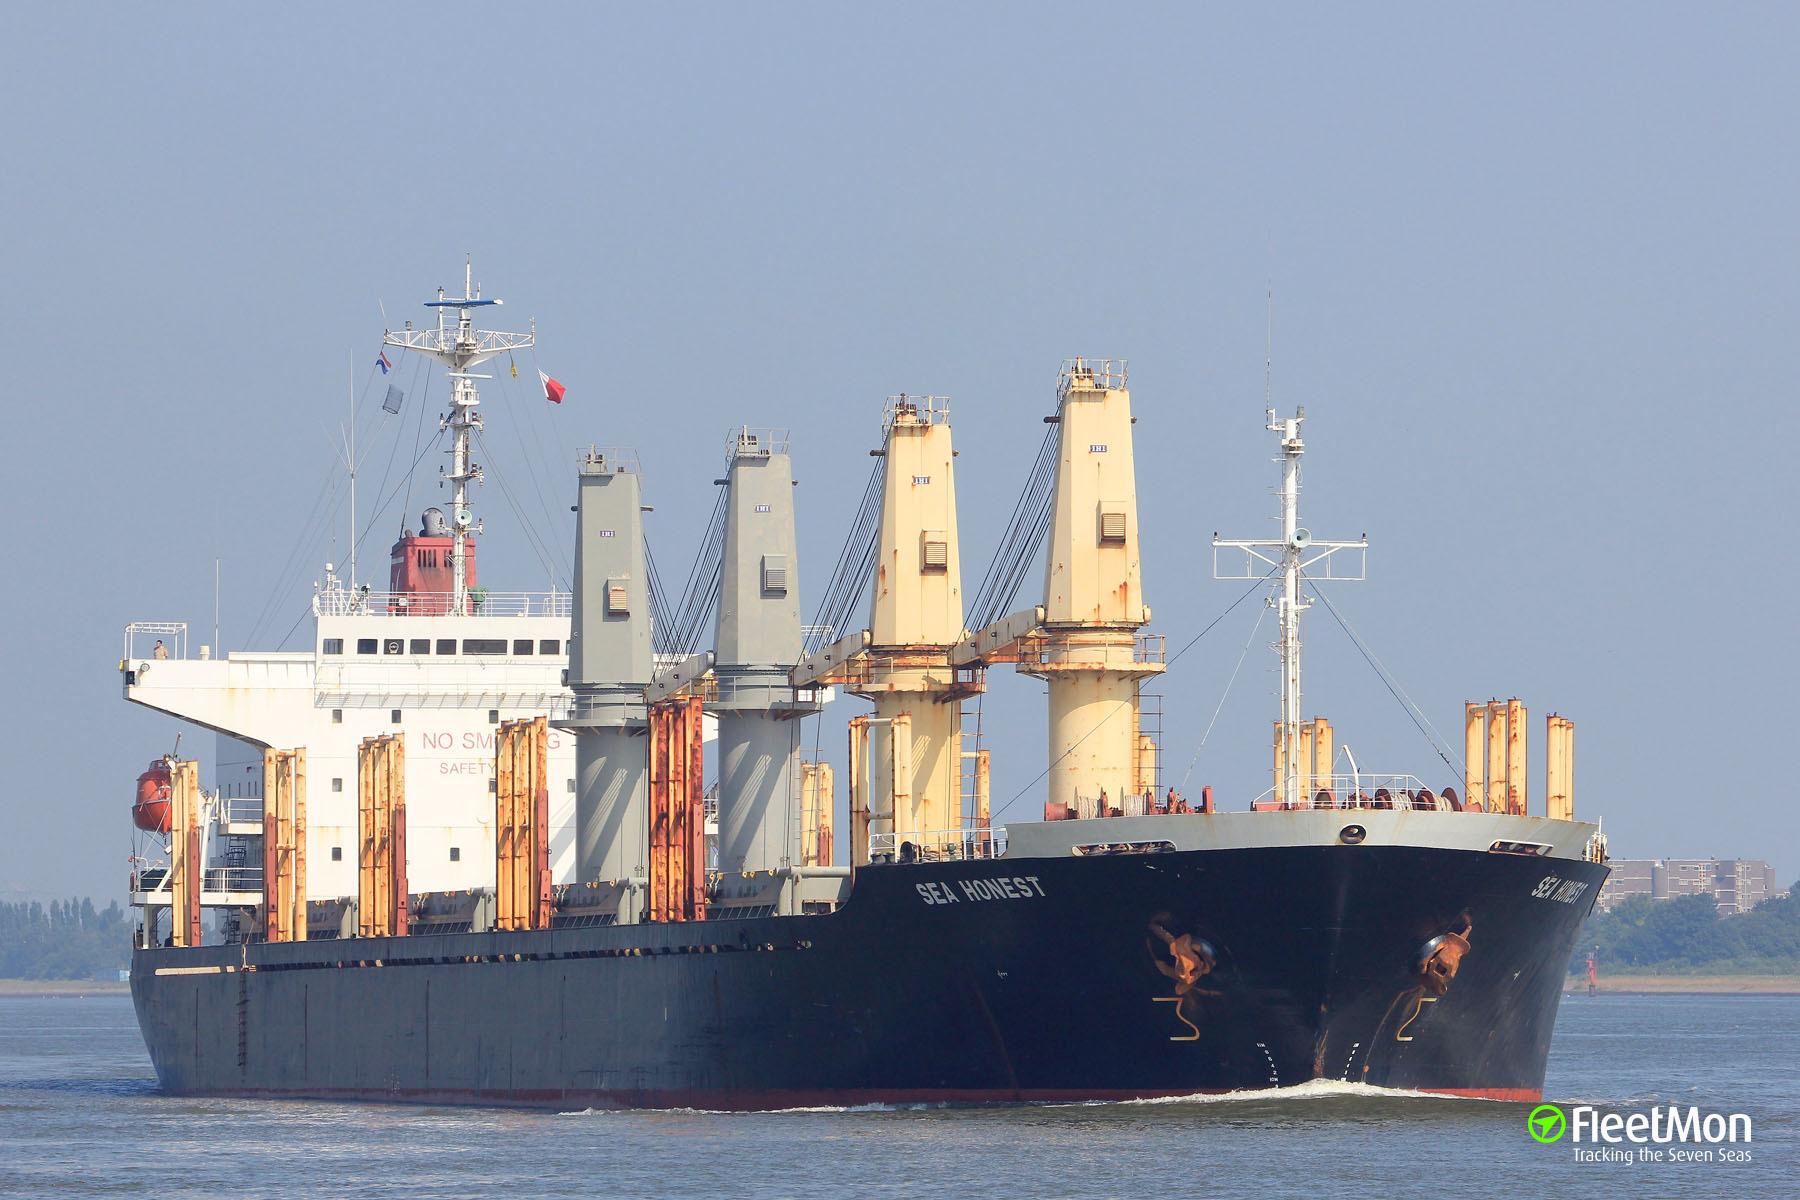 Bulk carrier SEA HONEST stranded in Alger, abandoned by owner